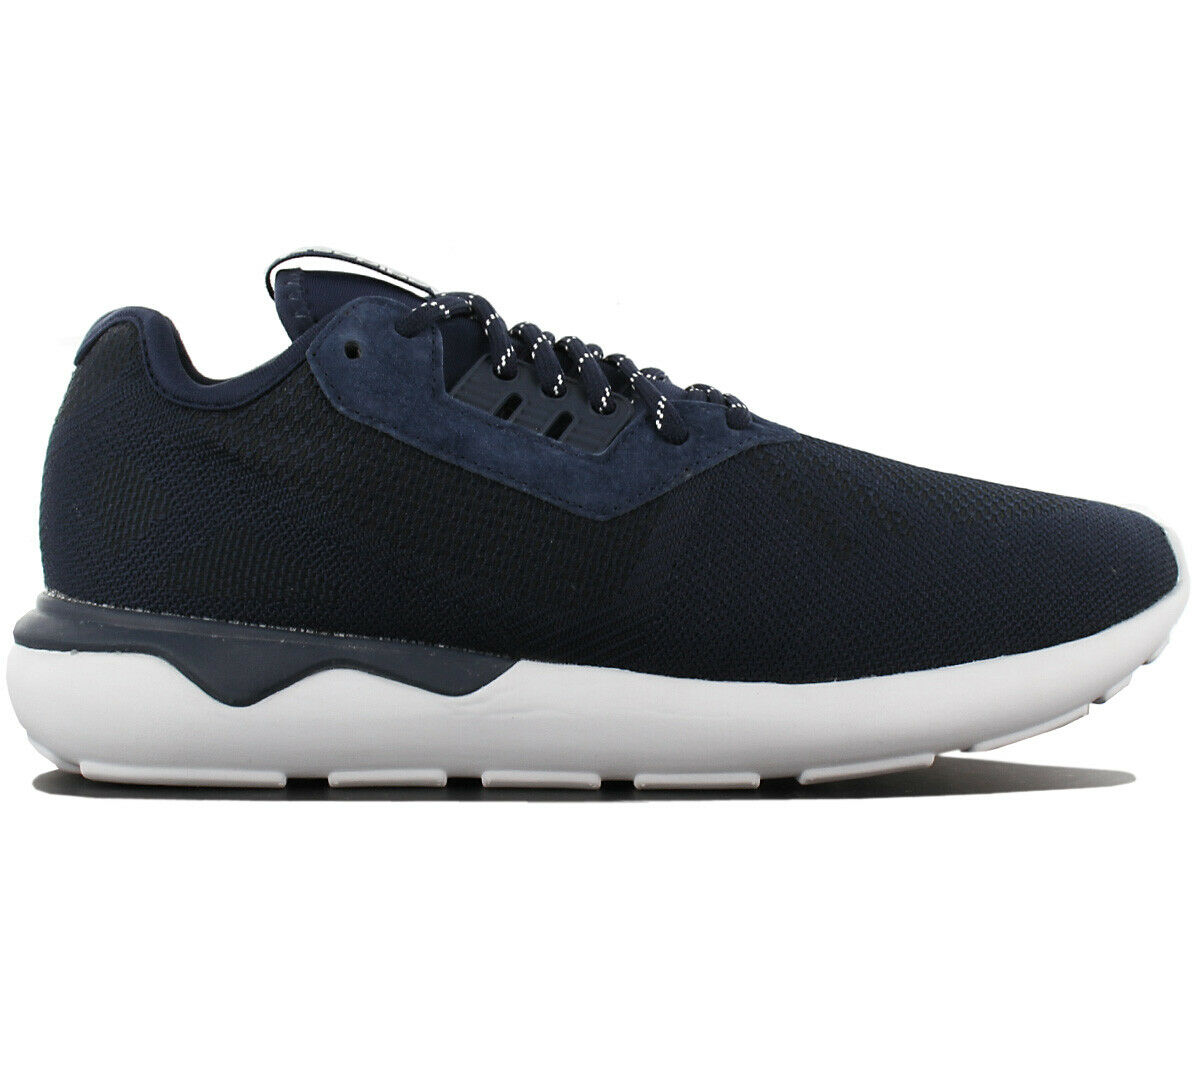 Adidas Originals Tubular Runner Weave Herren Turnschuhe Schuh Turnschuh Blau B25596